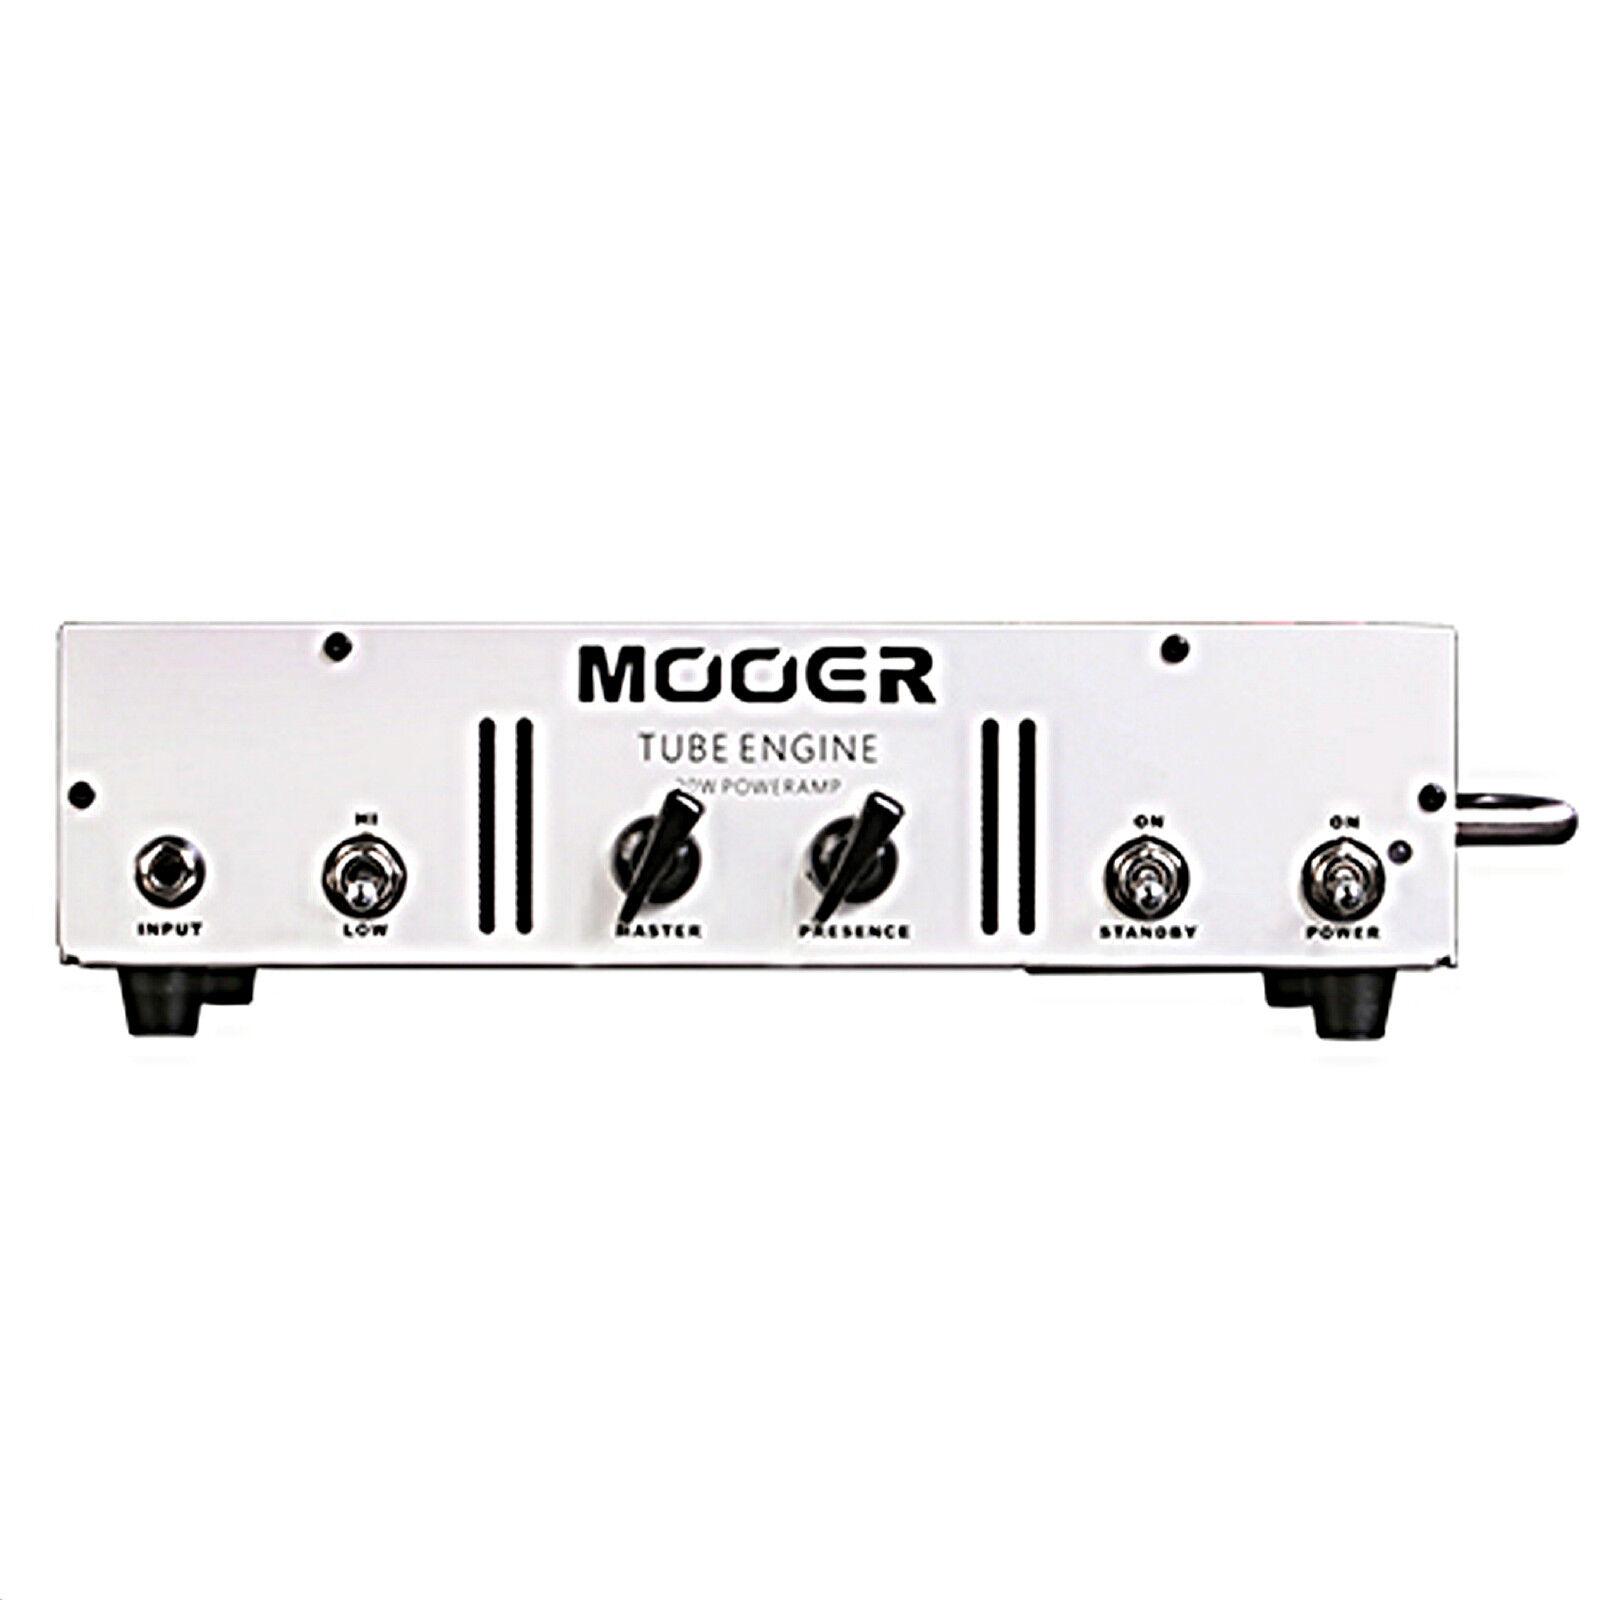 Mooer Tube Engine 20 All Tube Class A B 20 Watt Guitar Power Amplifier Head